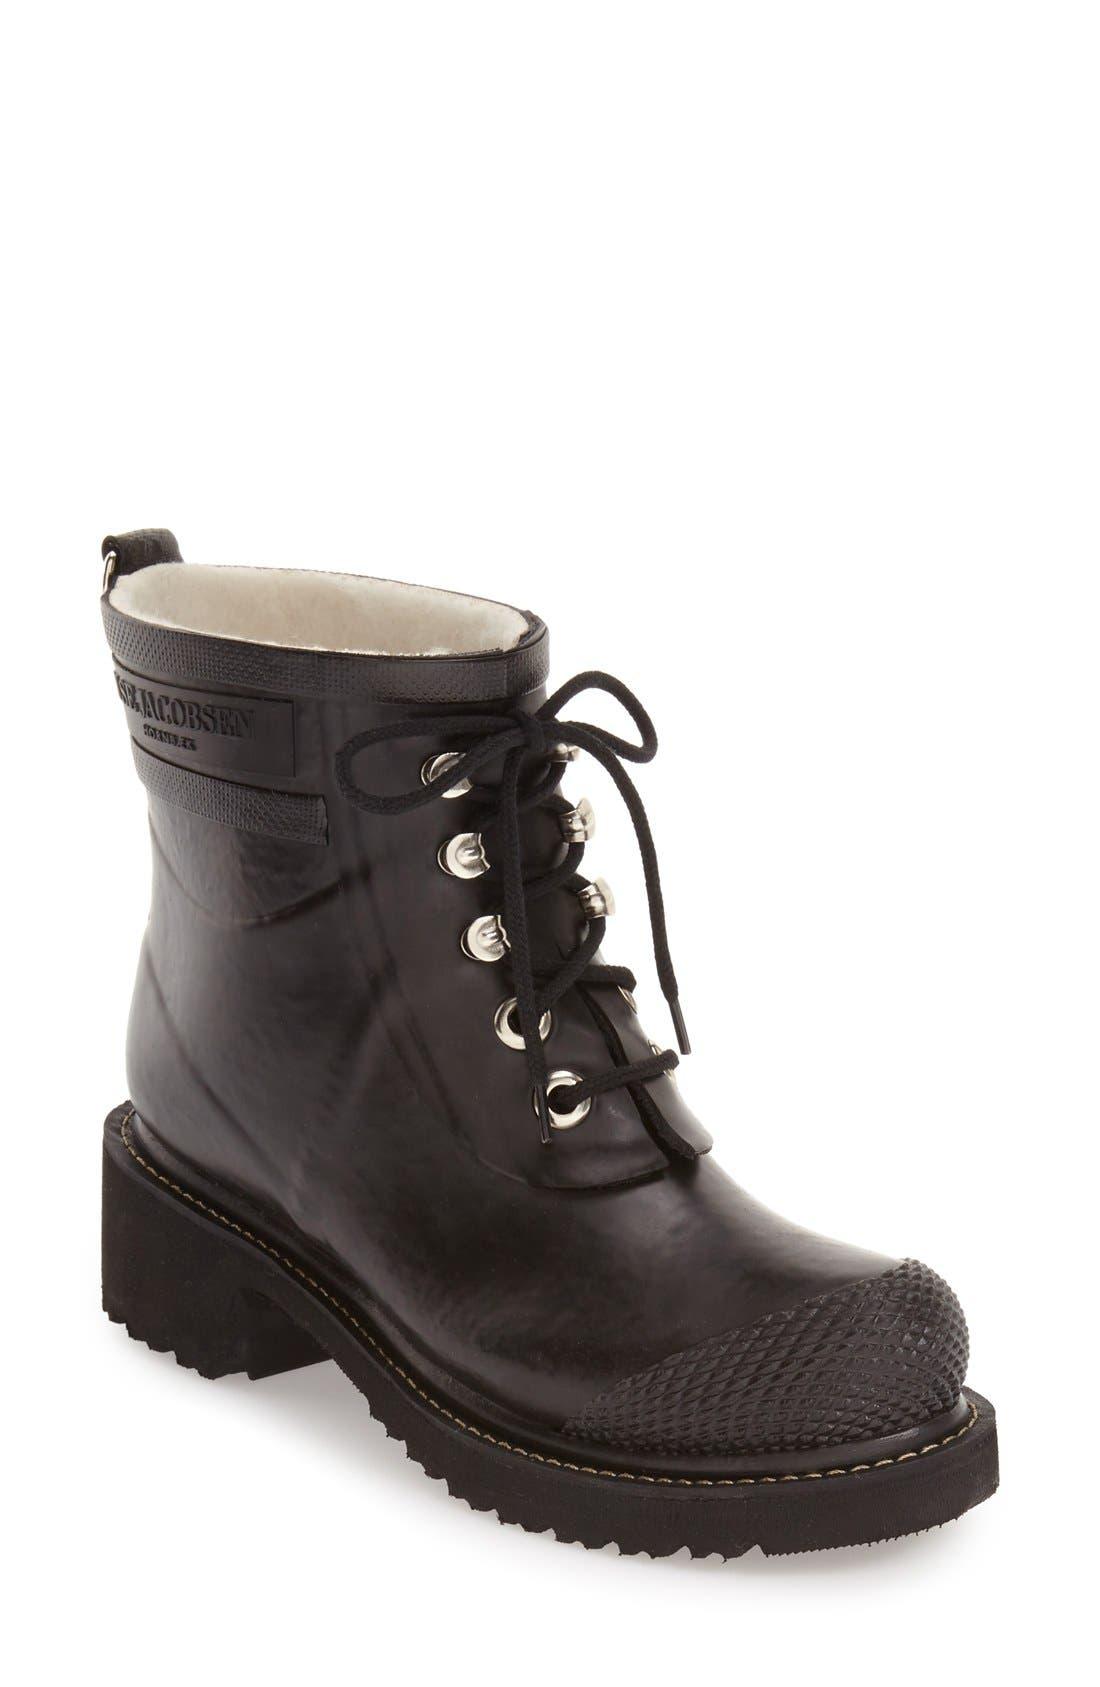 ILSE JACOBSEN Waterproof Lace-Up Short Snow/Rain Boot